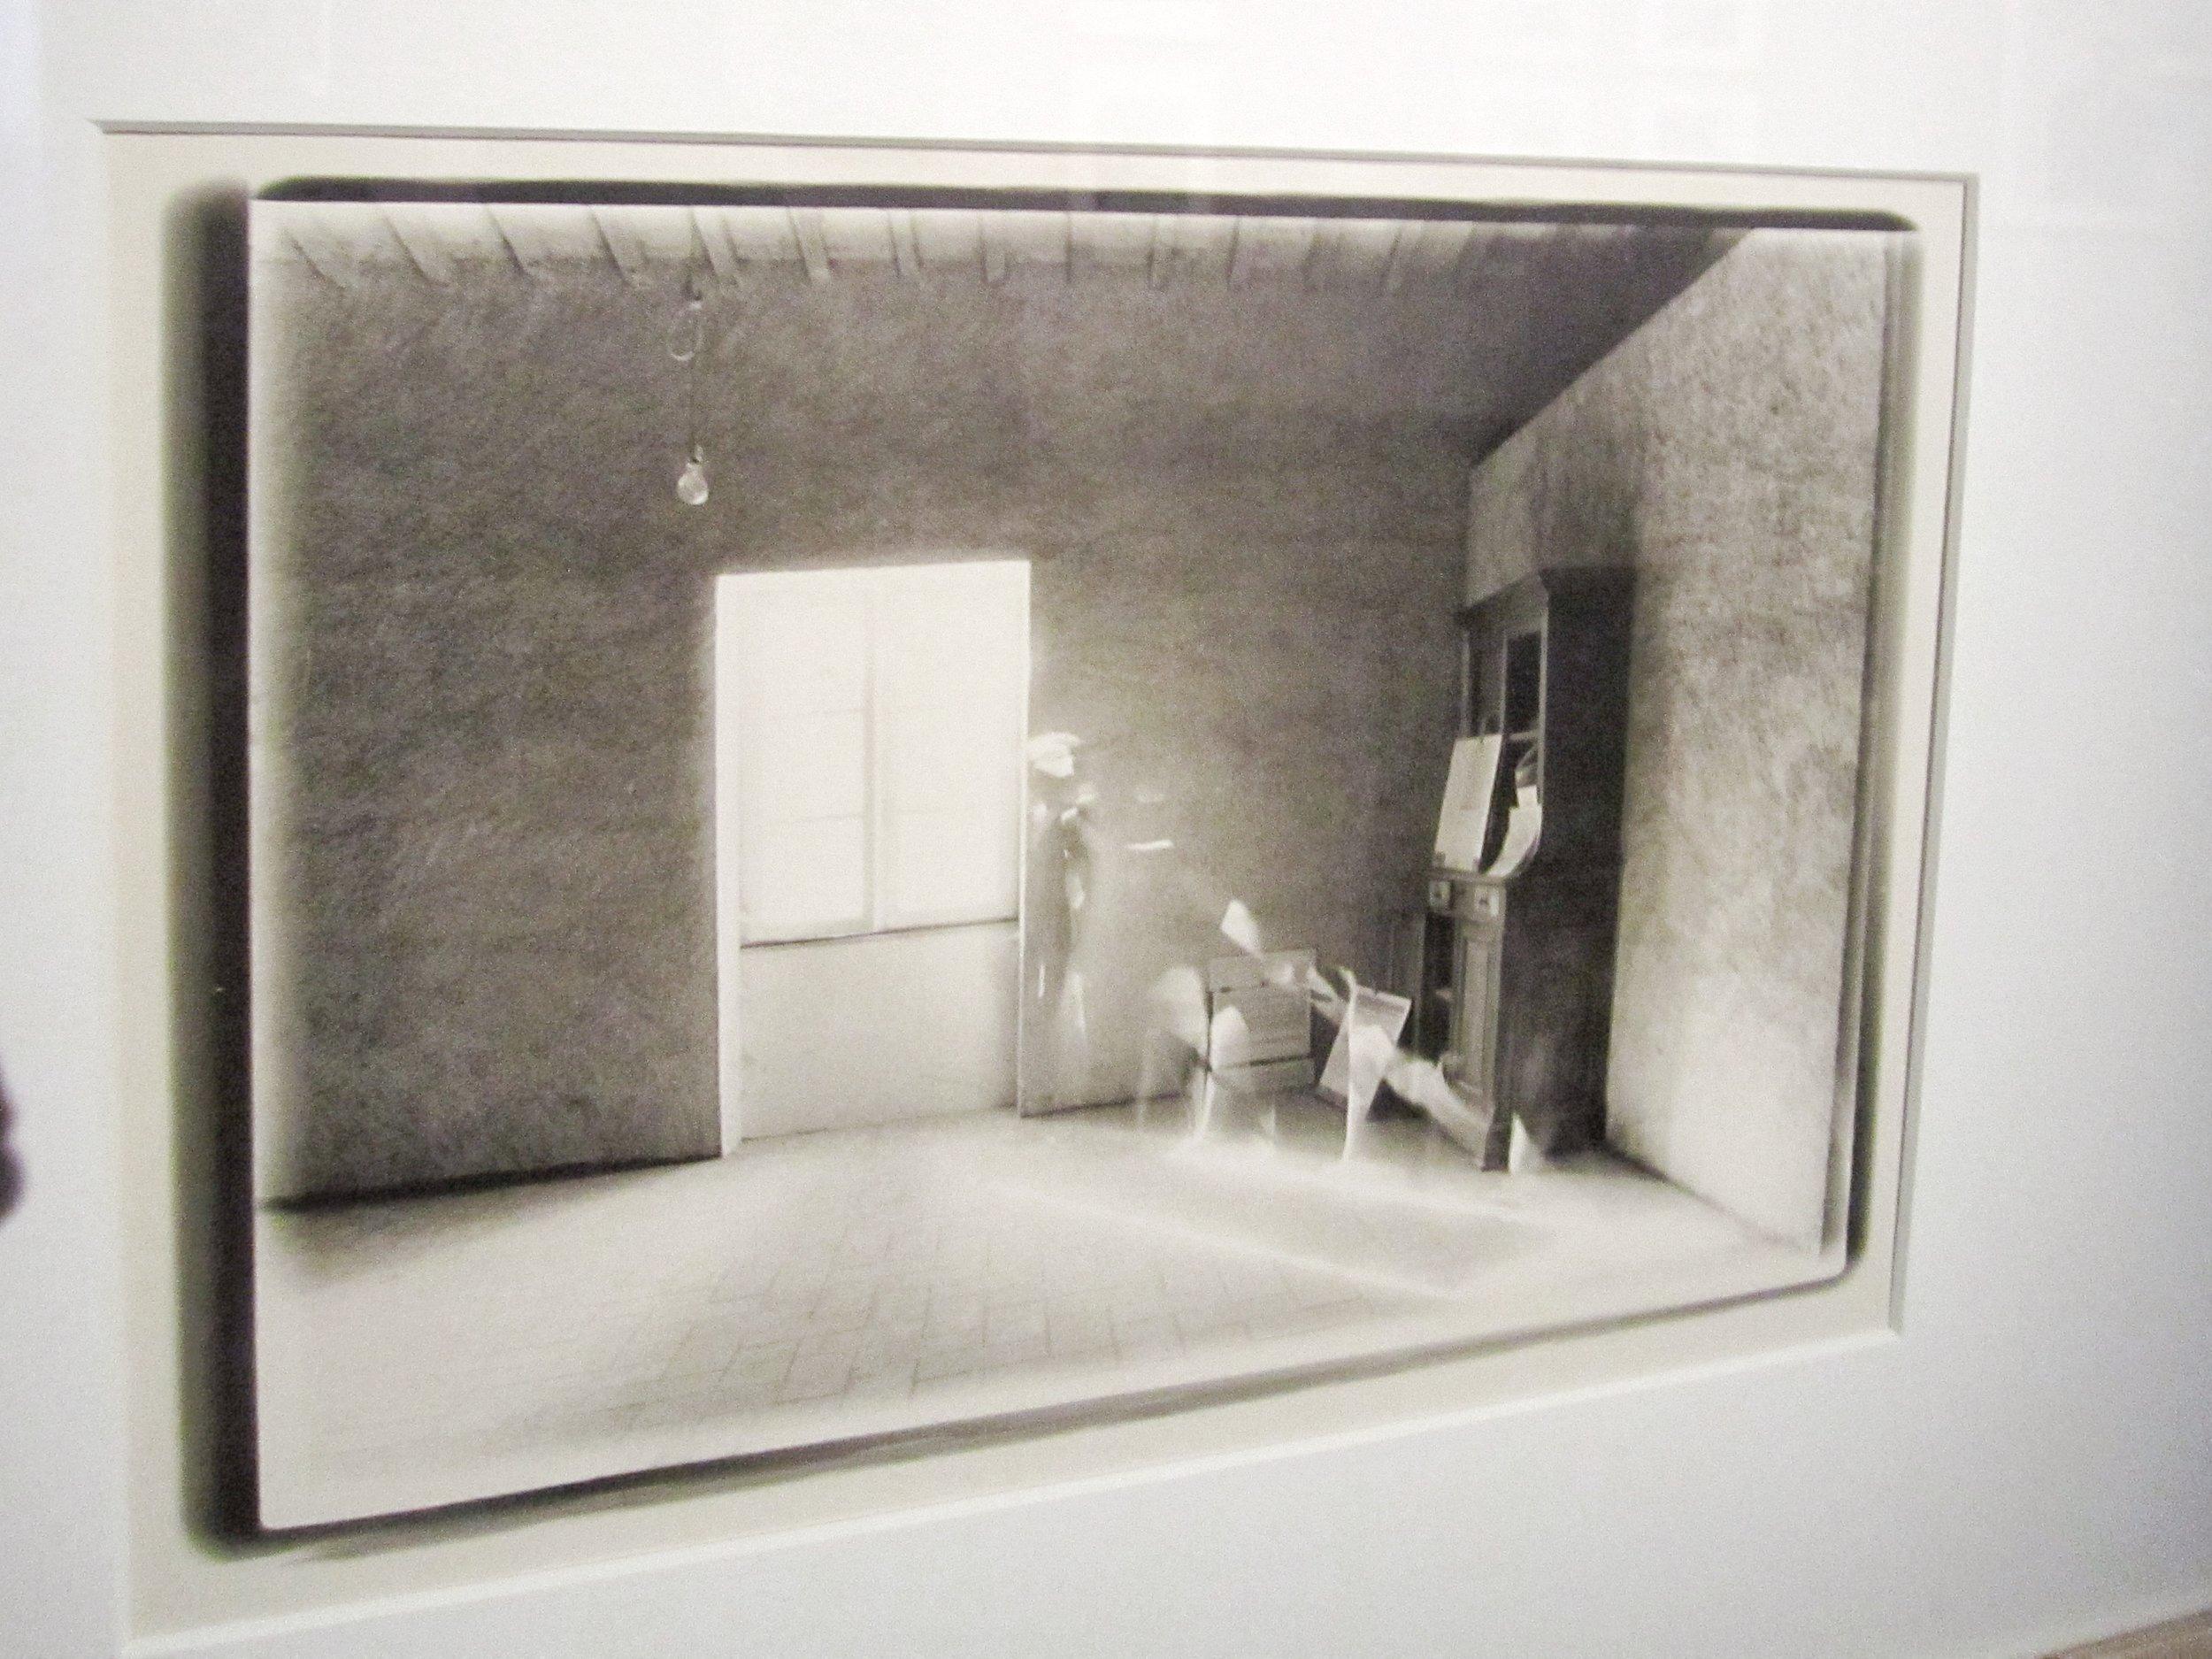 Alix Cléo Roubaud, Si quelque chose noir  series, 7 gelatin silver prints, 1980.